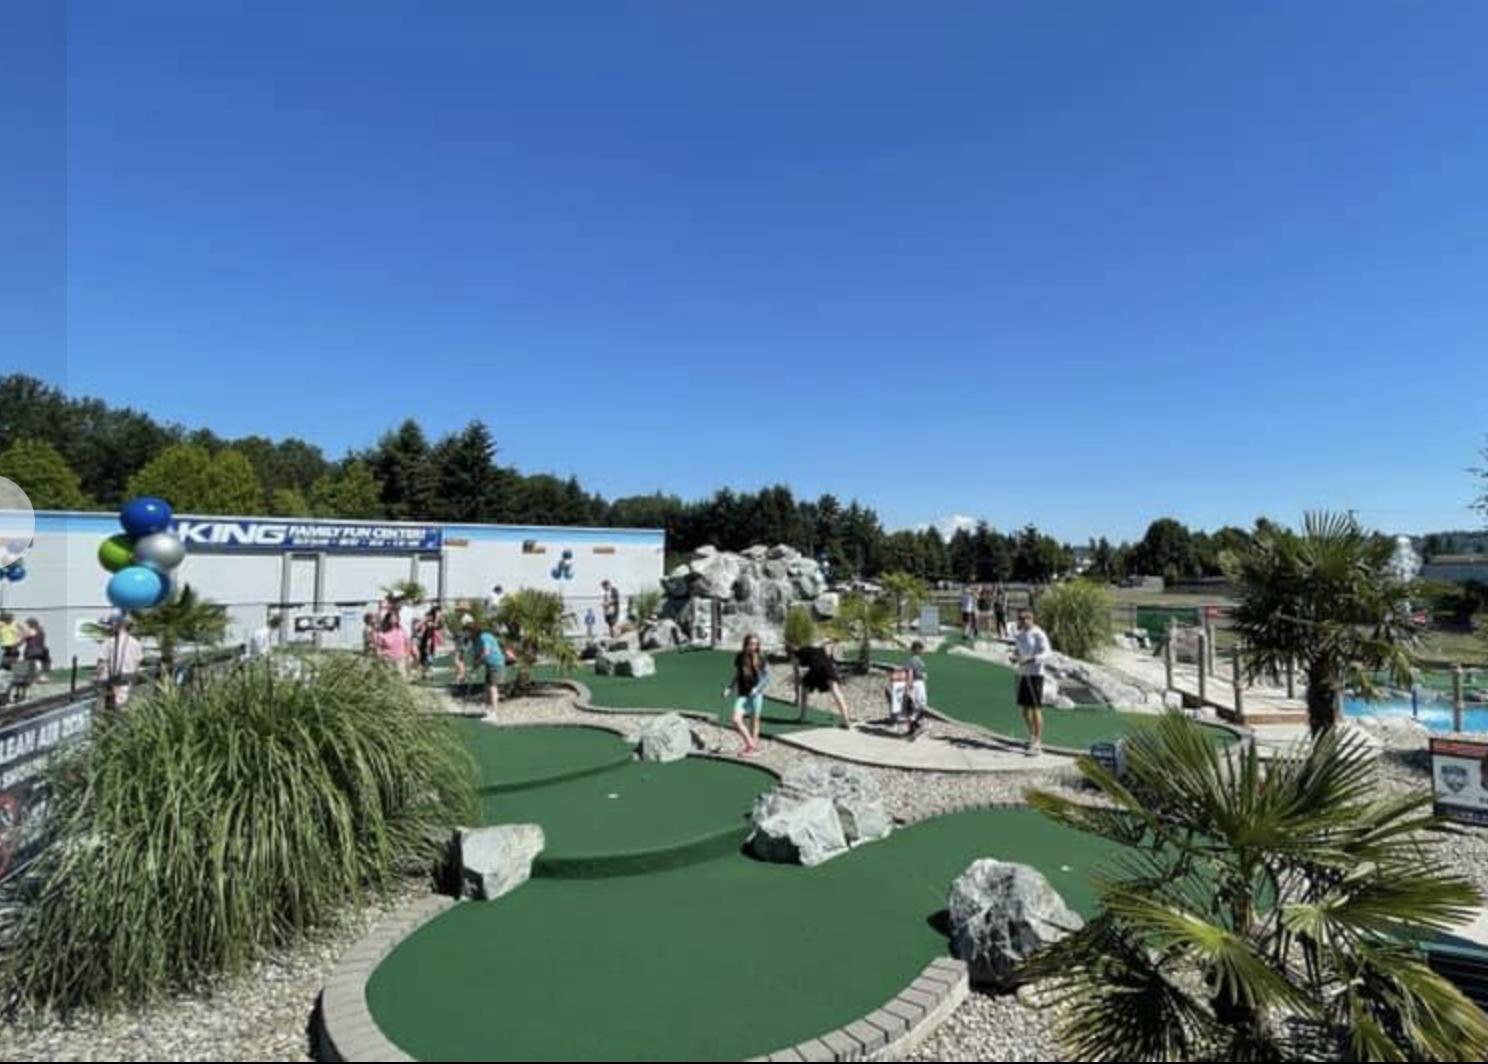 King Family Fun Center mini golf